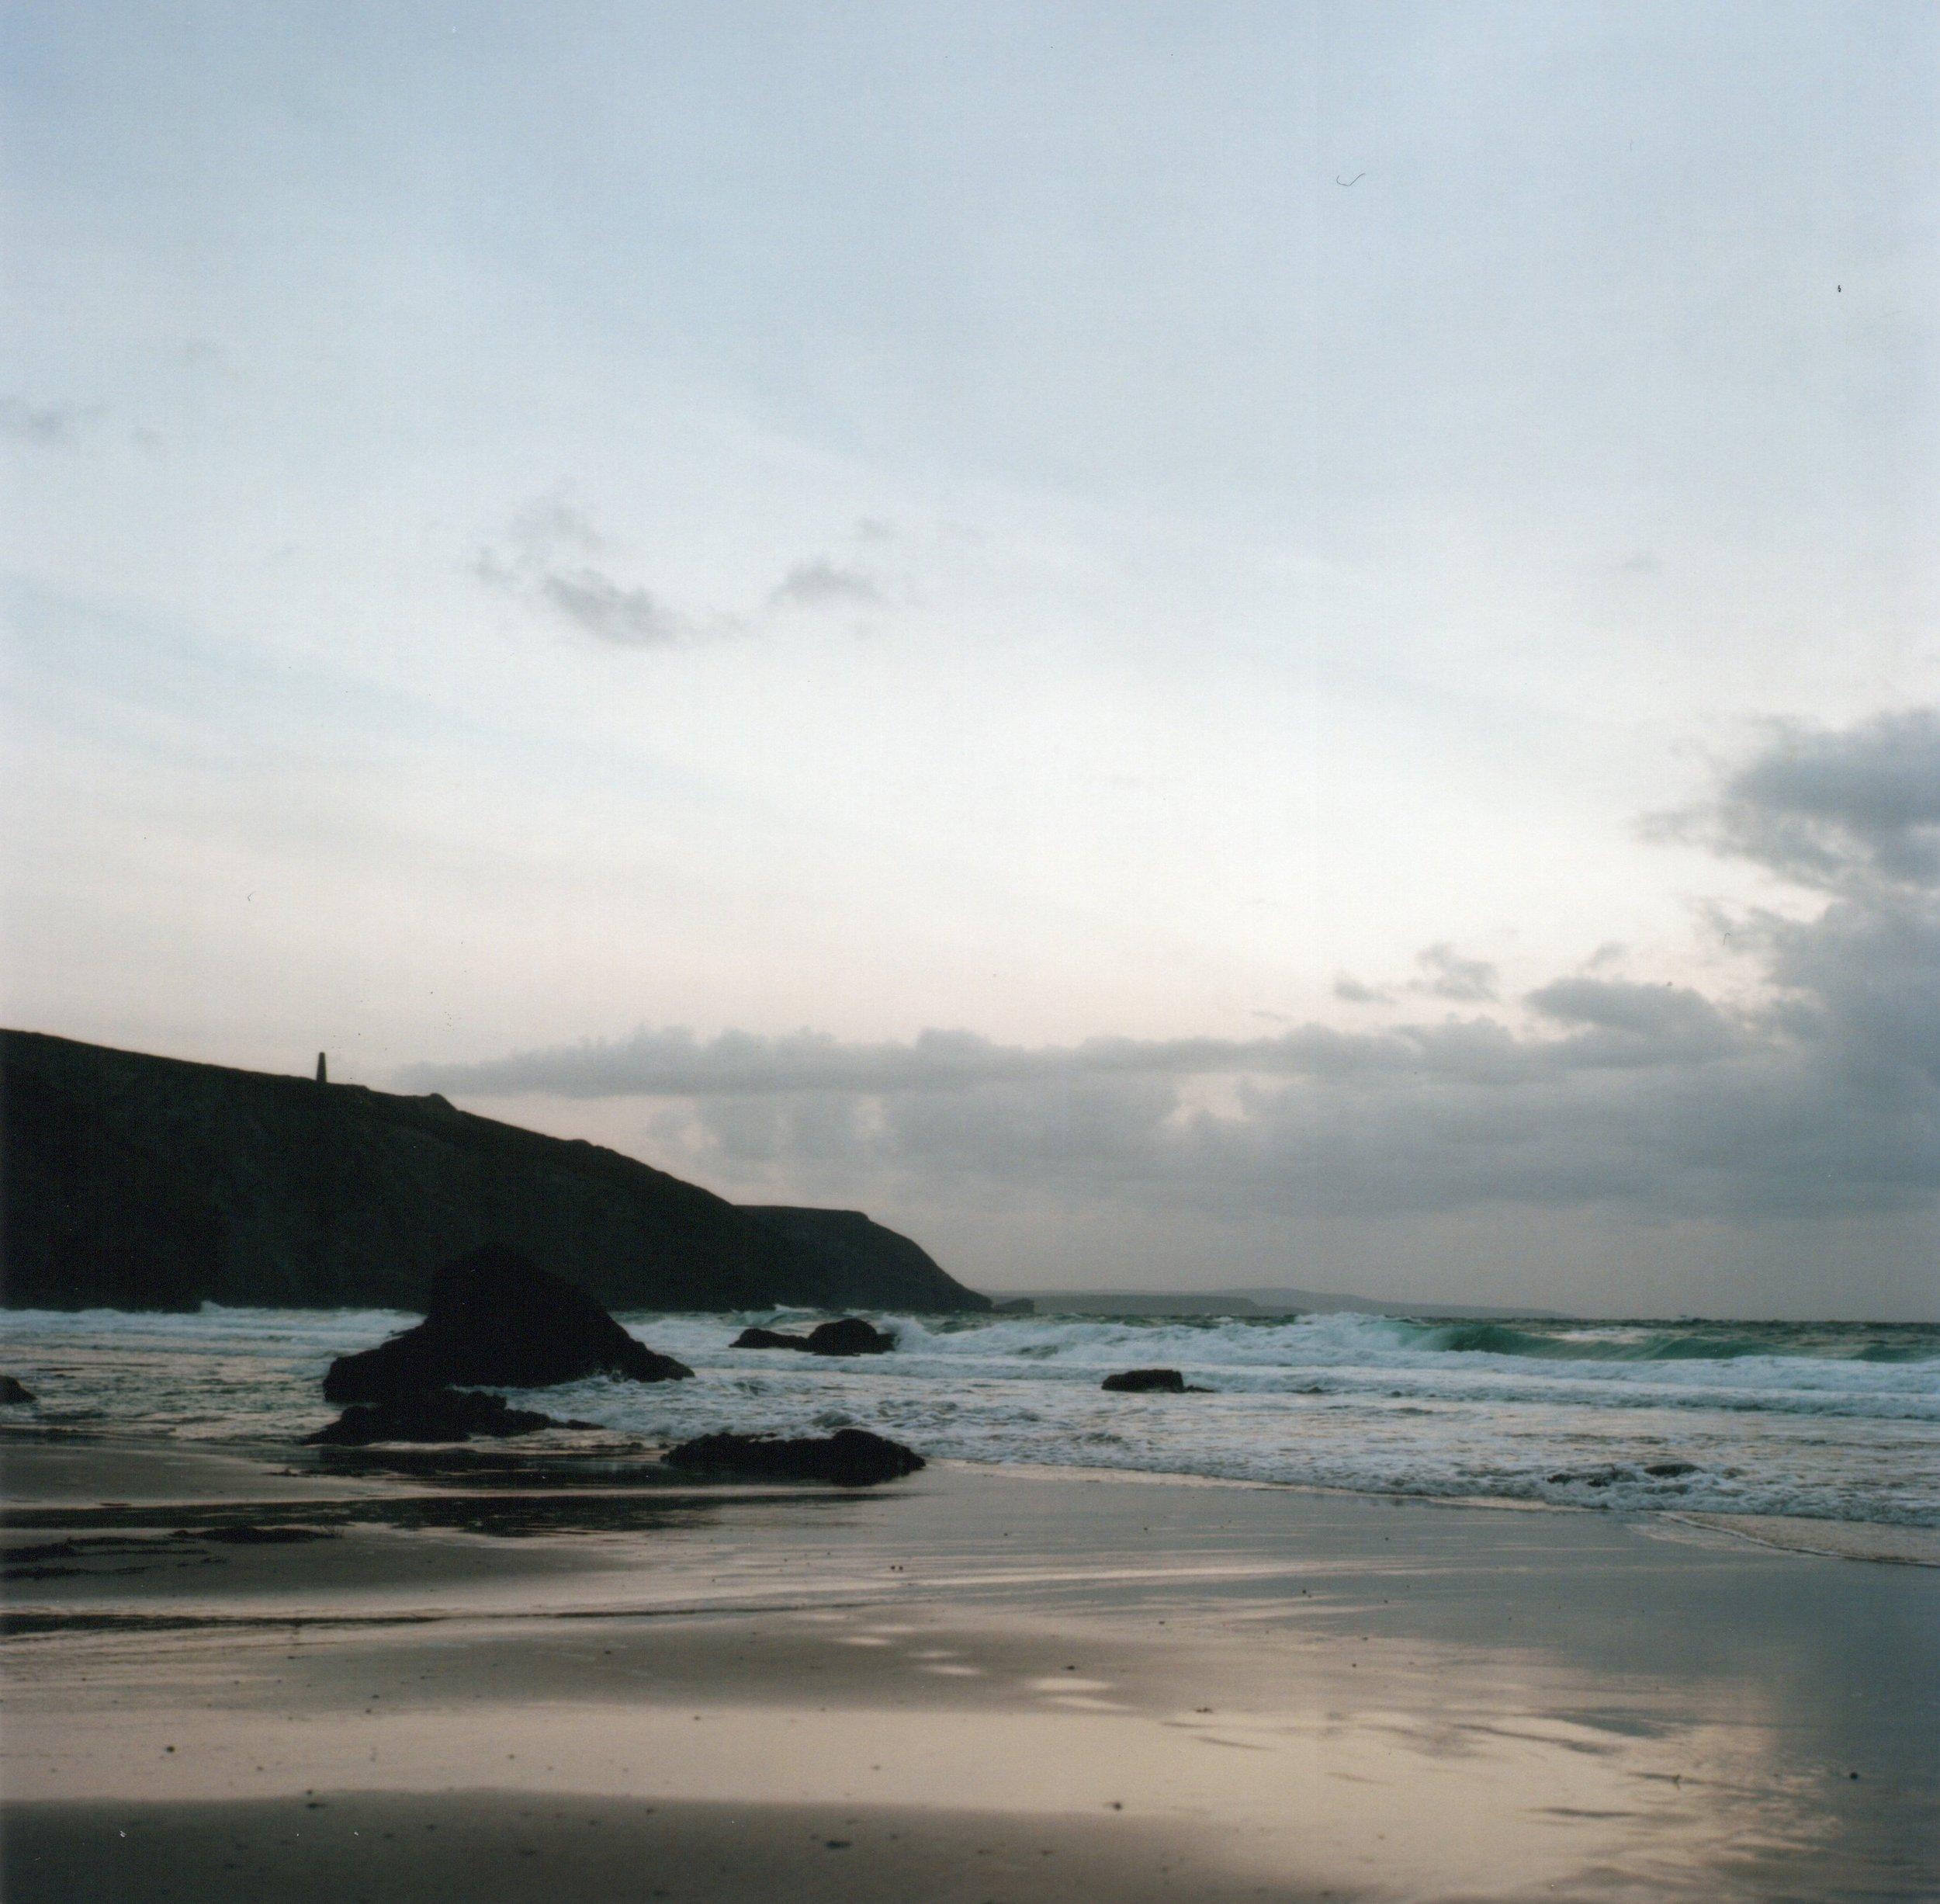 coastline f5.6 125th sec.jpg.jpg